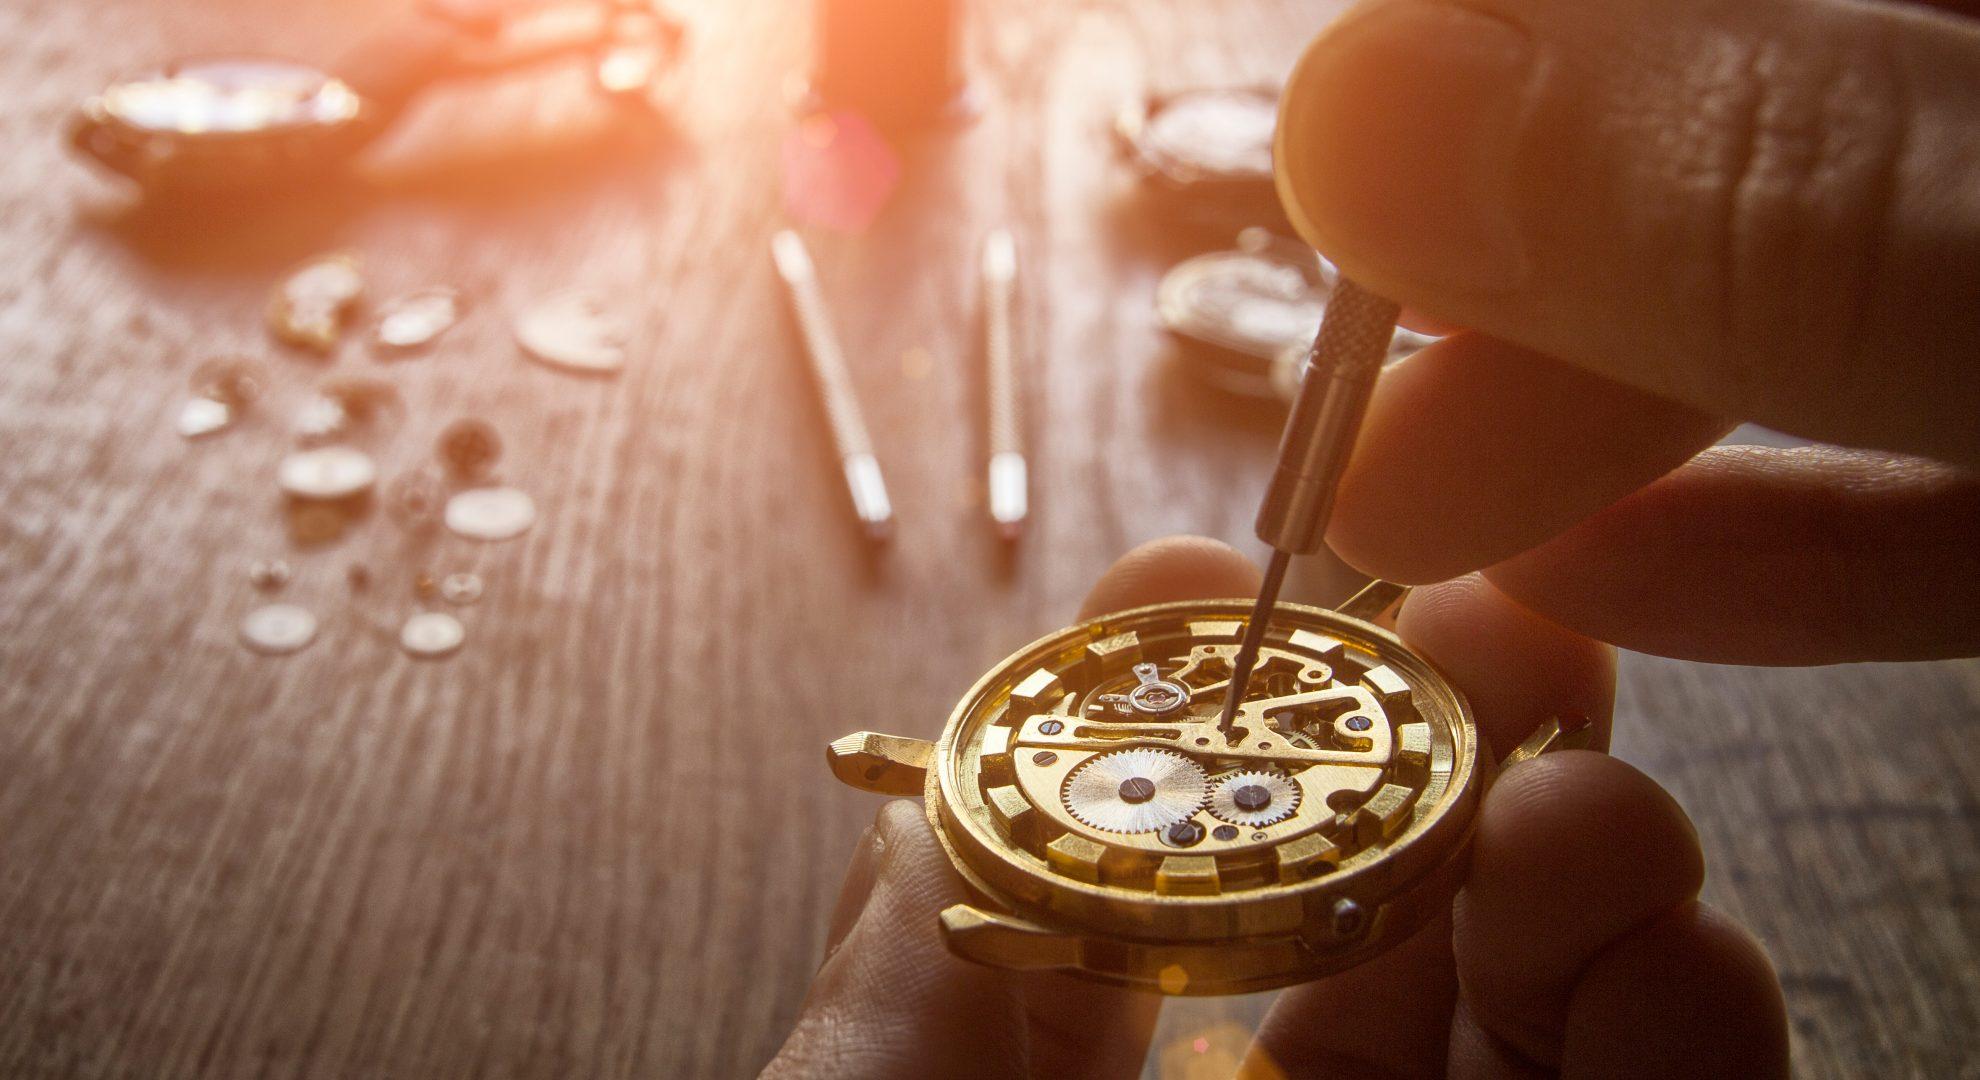 luxury translation services for haute horlogerie